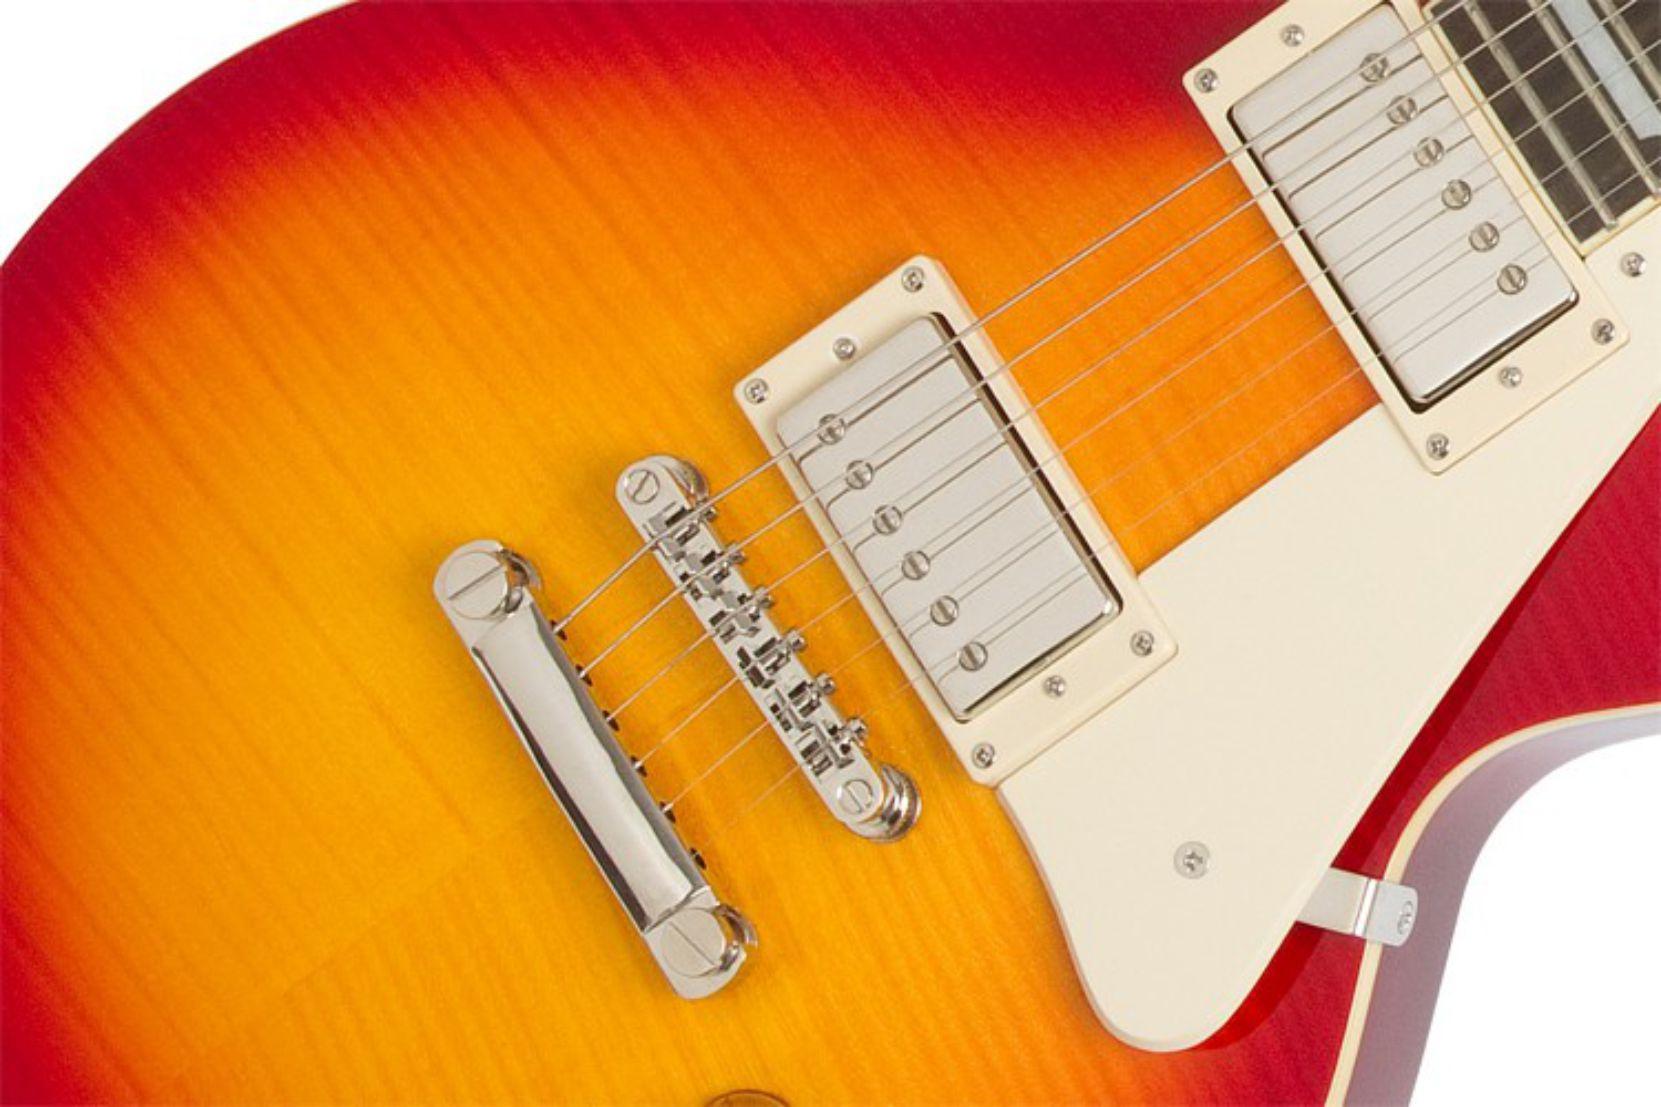 Guitarra Epiphone les paul standard heritage cherry sunburst